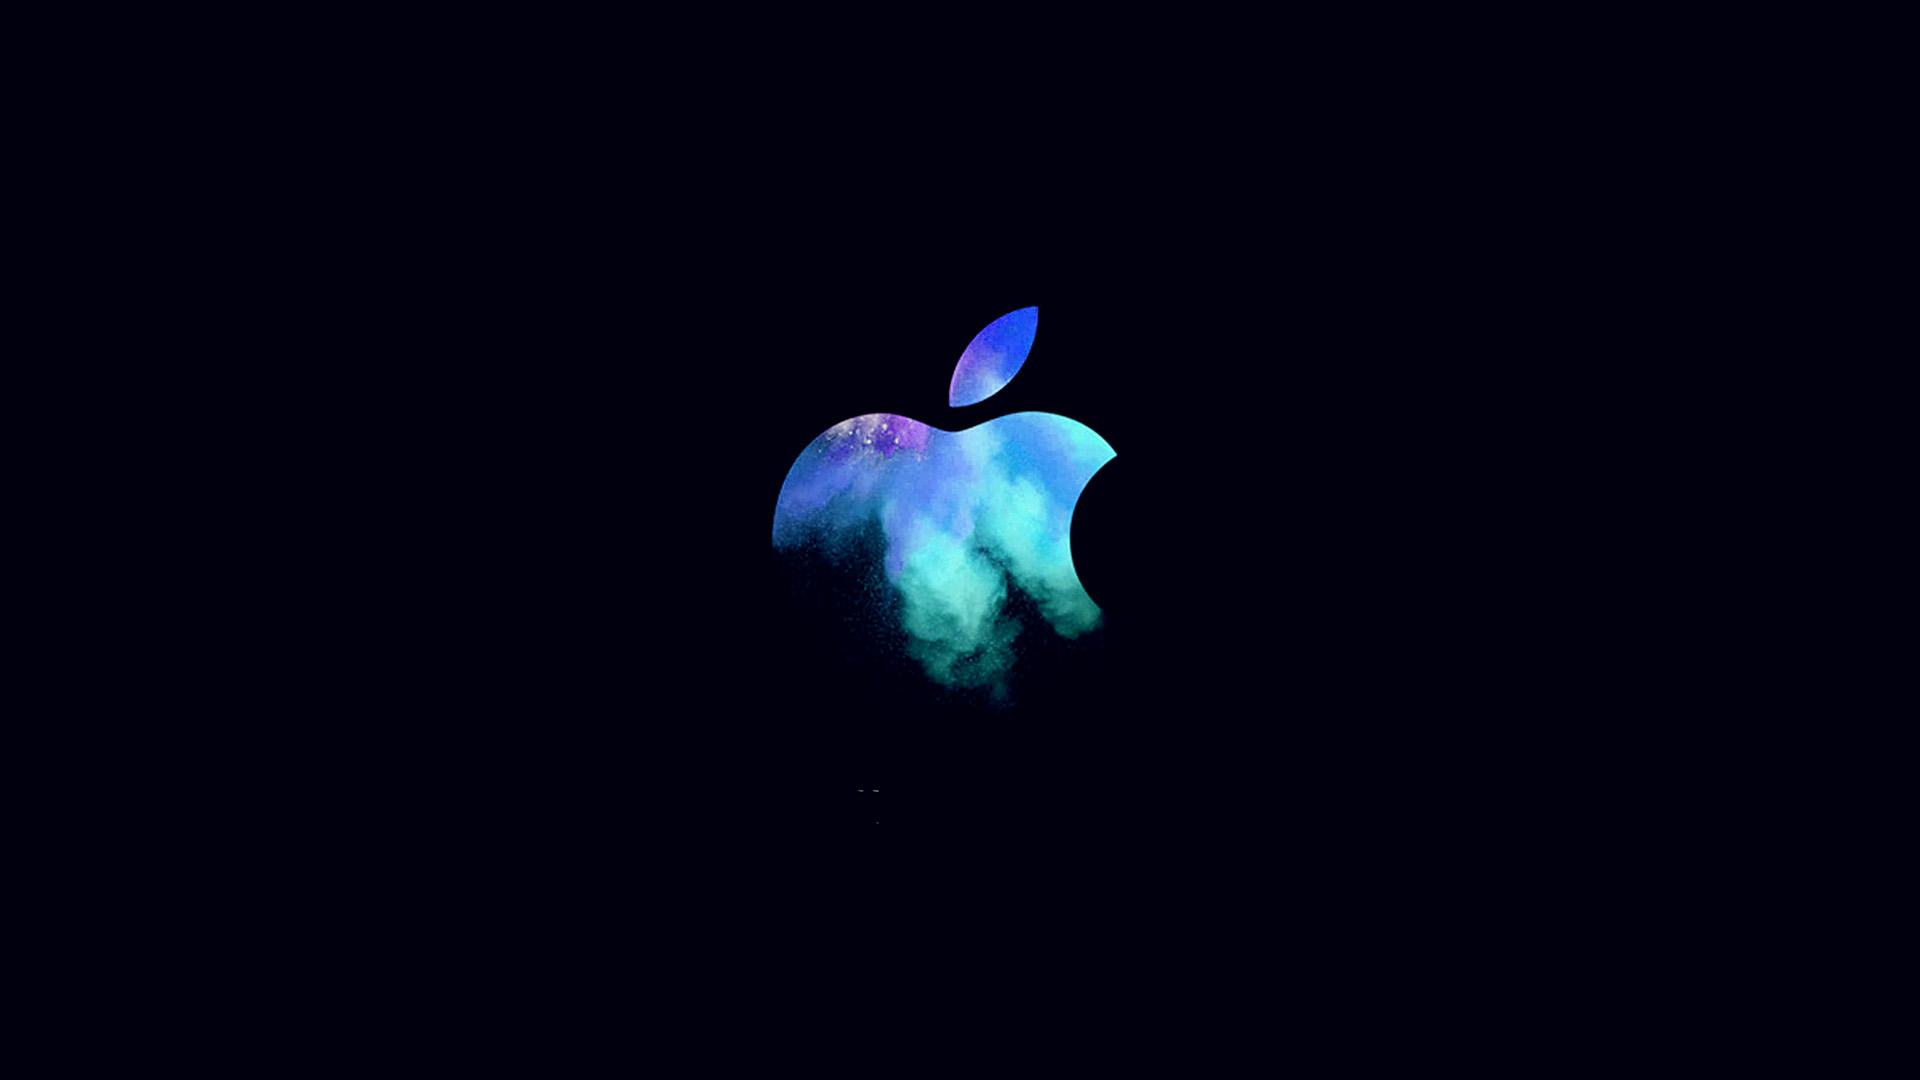 Au33 Apple Mac Event Logo Dark Illustration Art Blue Wallpaper